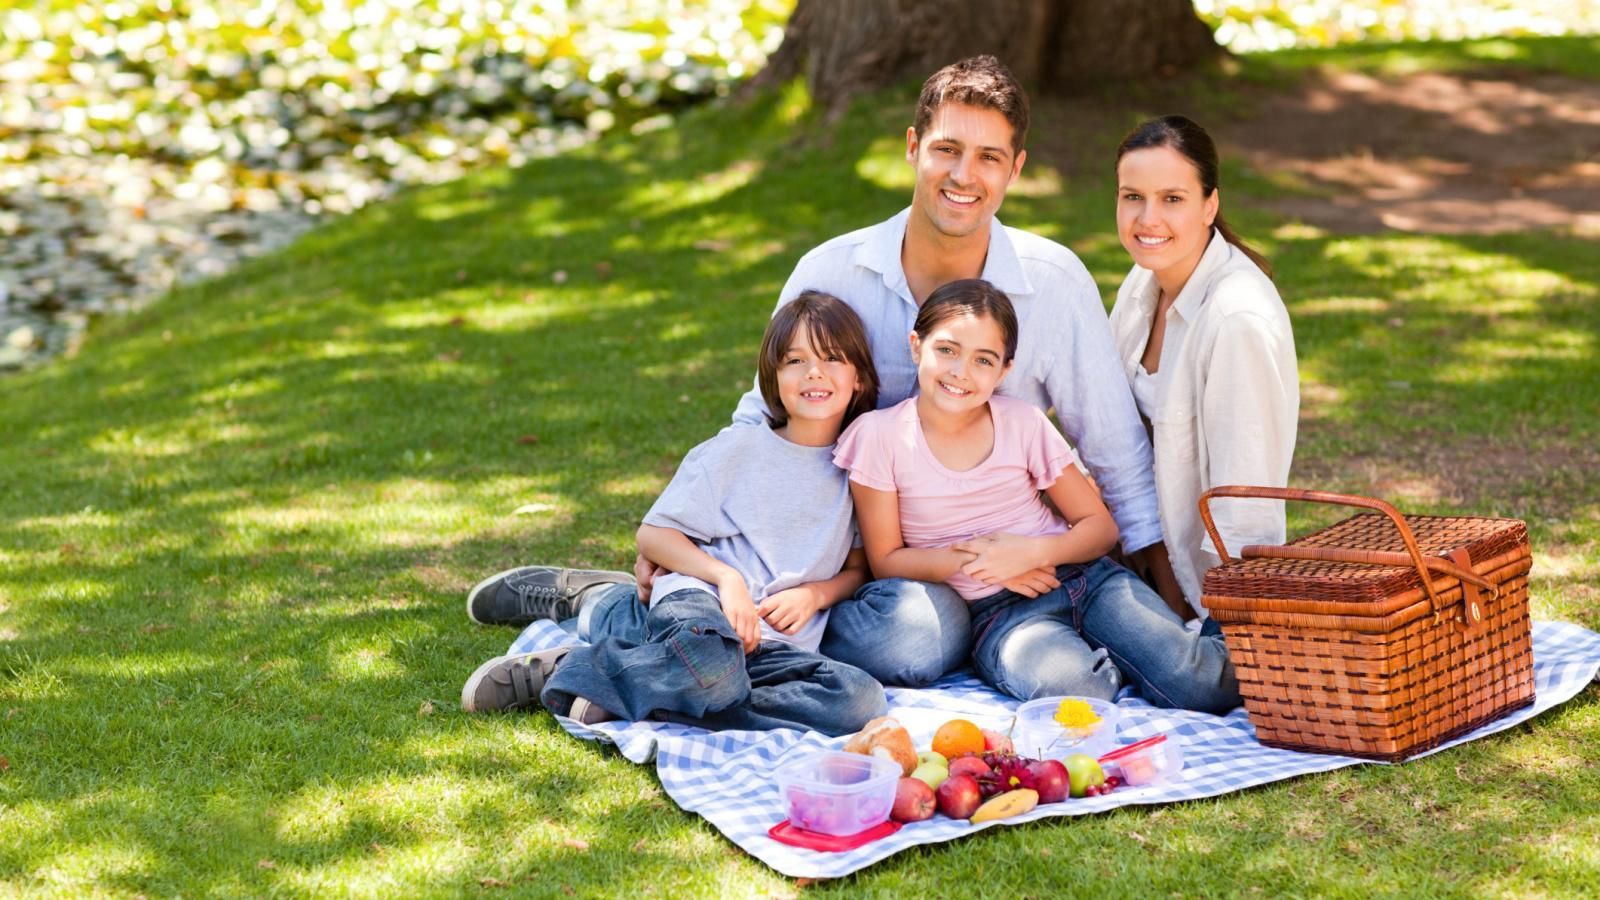 5 секретов удачного пикника